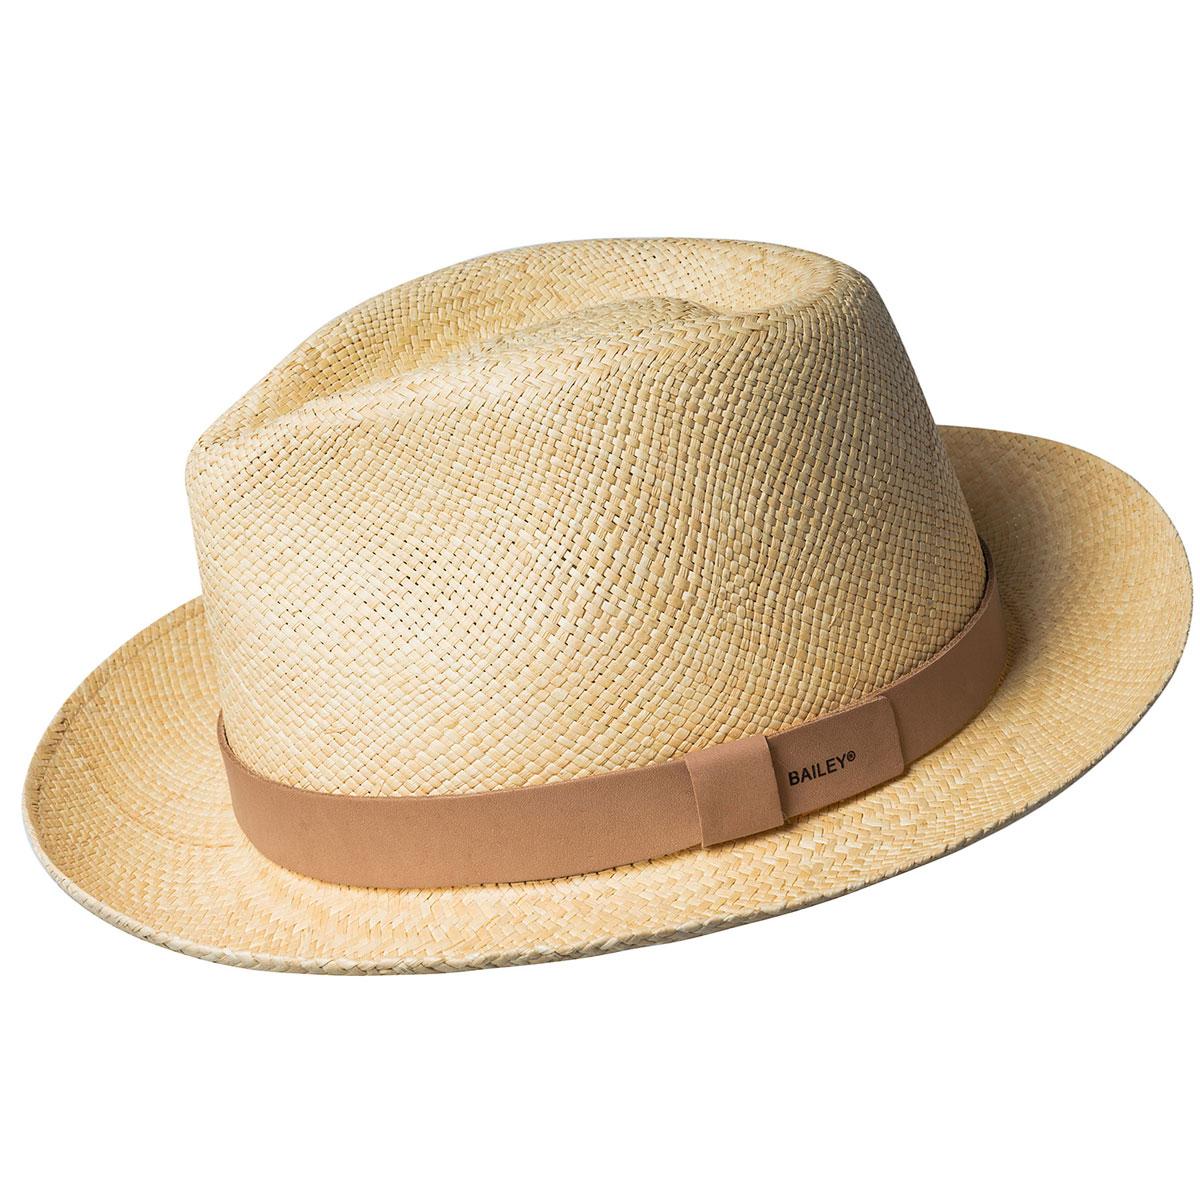 1960s – 70s Style Men's Hats Gelhorn Panama Fedora $120.00 AT vintagedancer.com